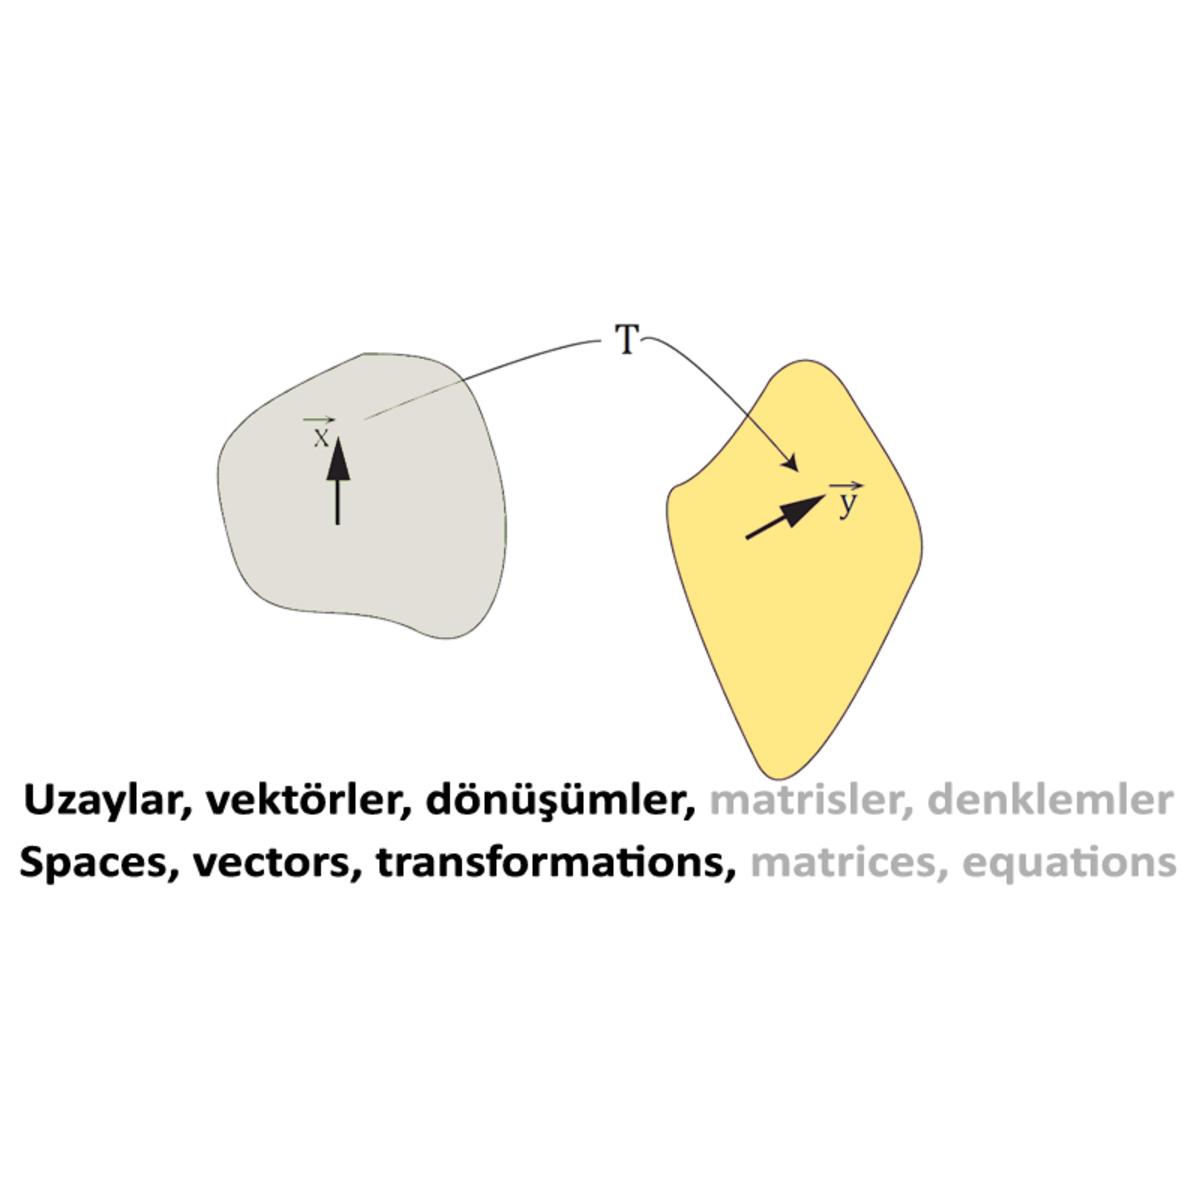 Doğrusal Cebir I: Uzaylar ve İşlemciler / Linear Algebra I: Spaces and Operators course image